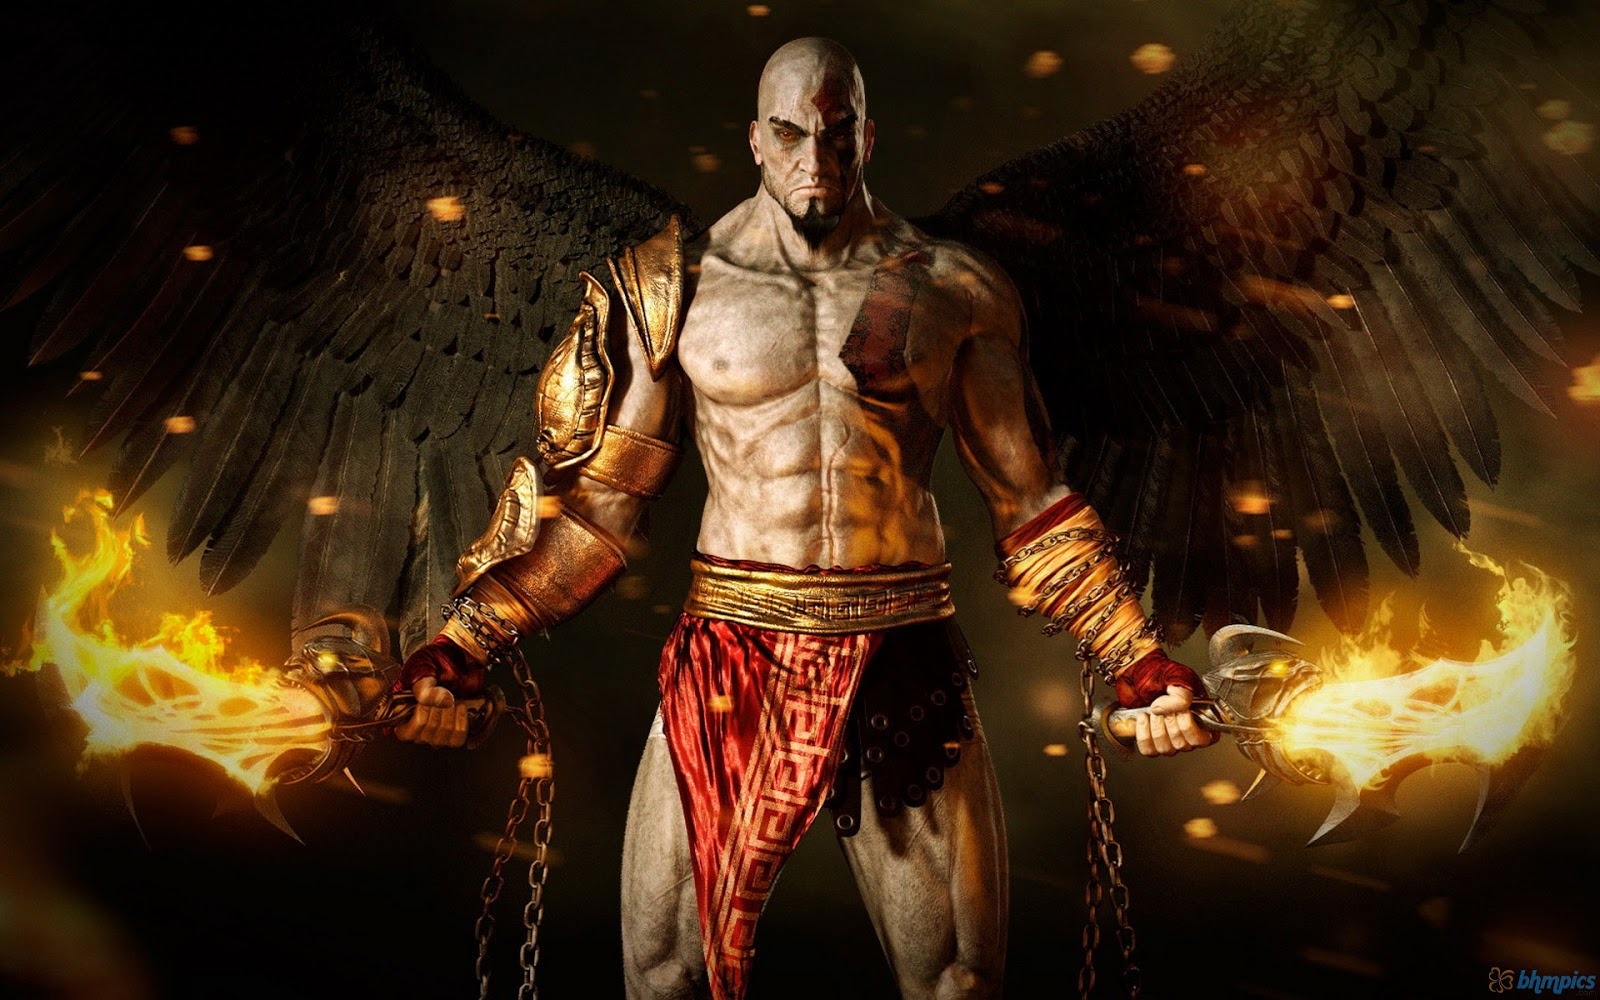 Portal dos mitos kratos - Wallpaper kratos ...